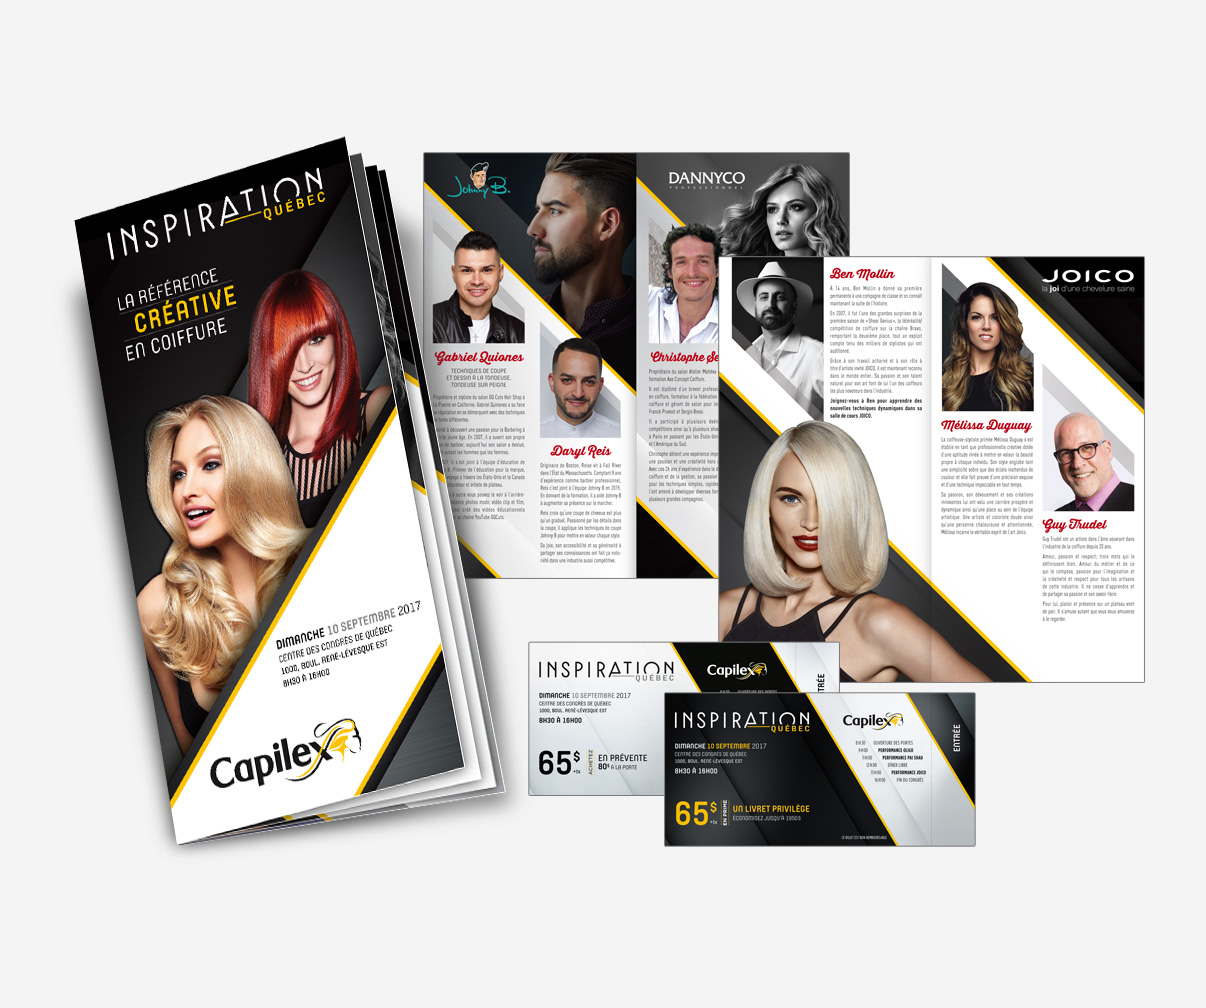 Capilex - Programme Inspiration Québec 2017